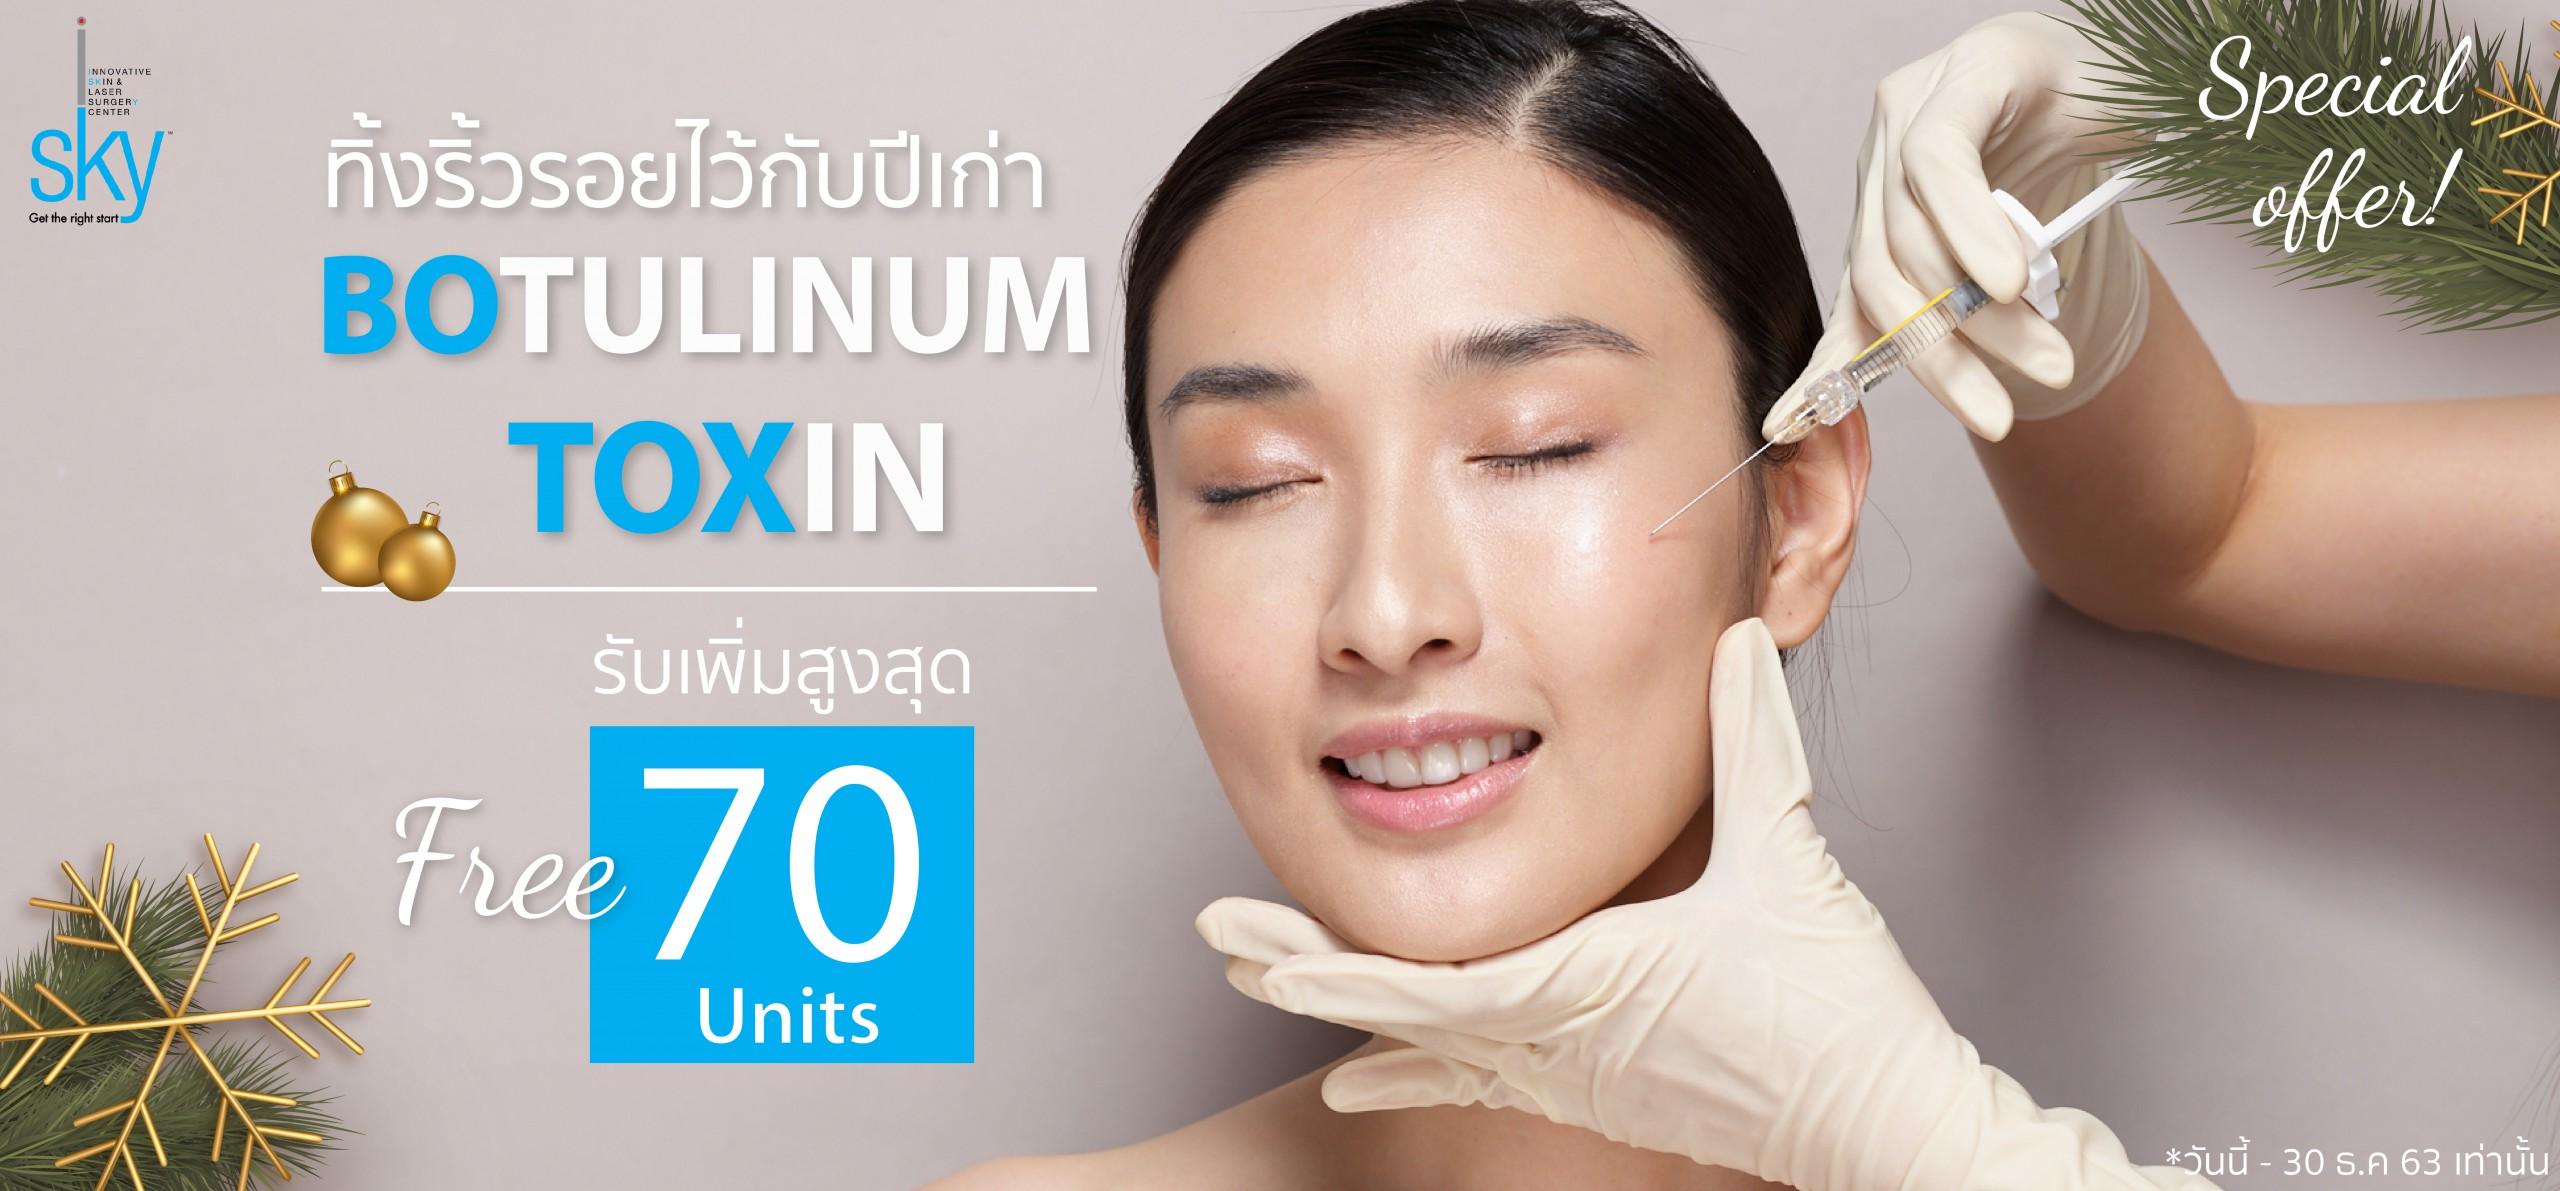 Botulinum toxin💙 ‼️ ยิ่งซื้อยิ่งเเถมเยอะ สูงสุดถึง 70 Units‼️